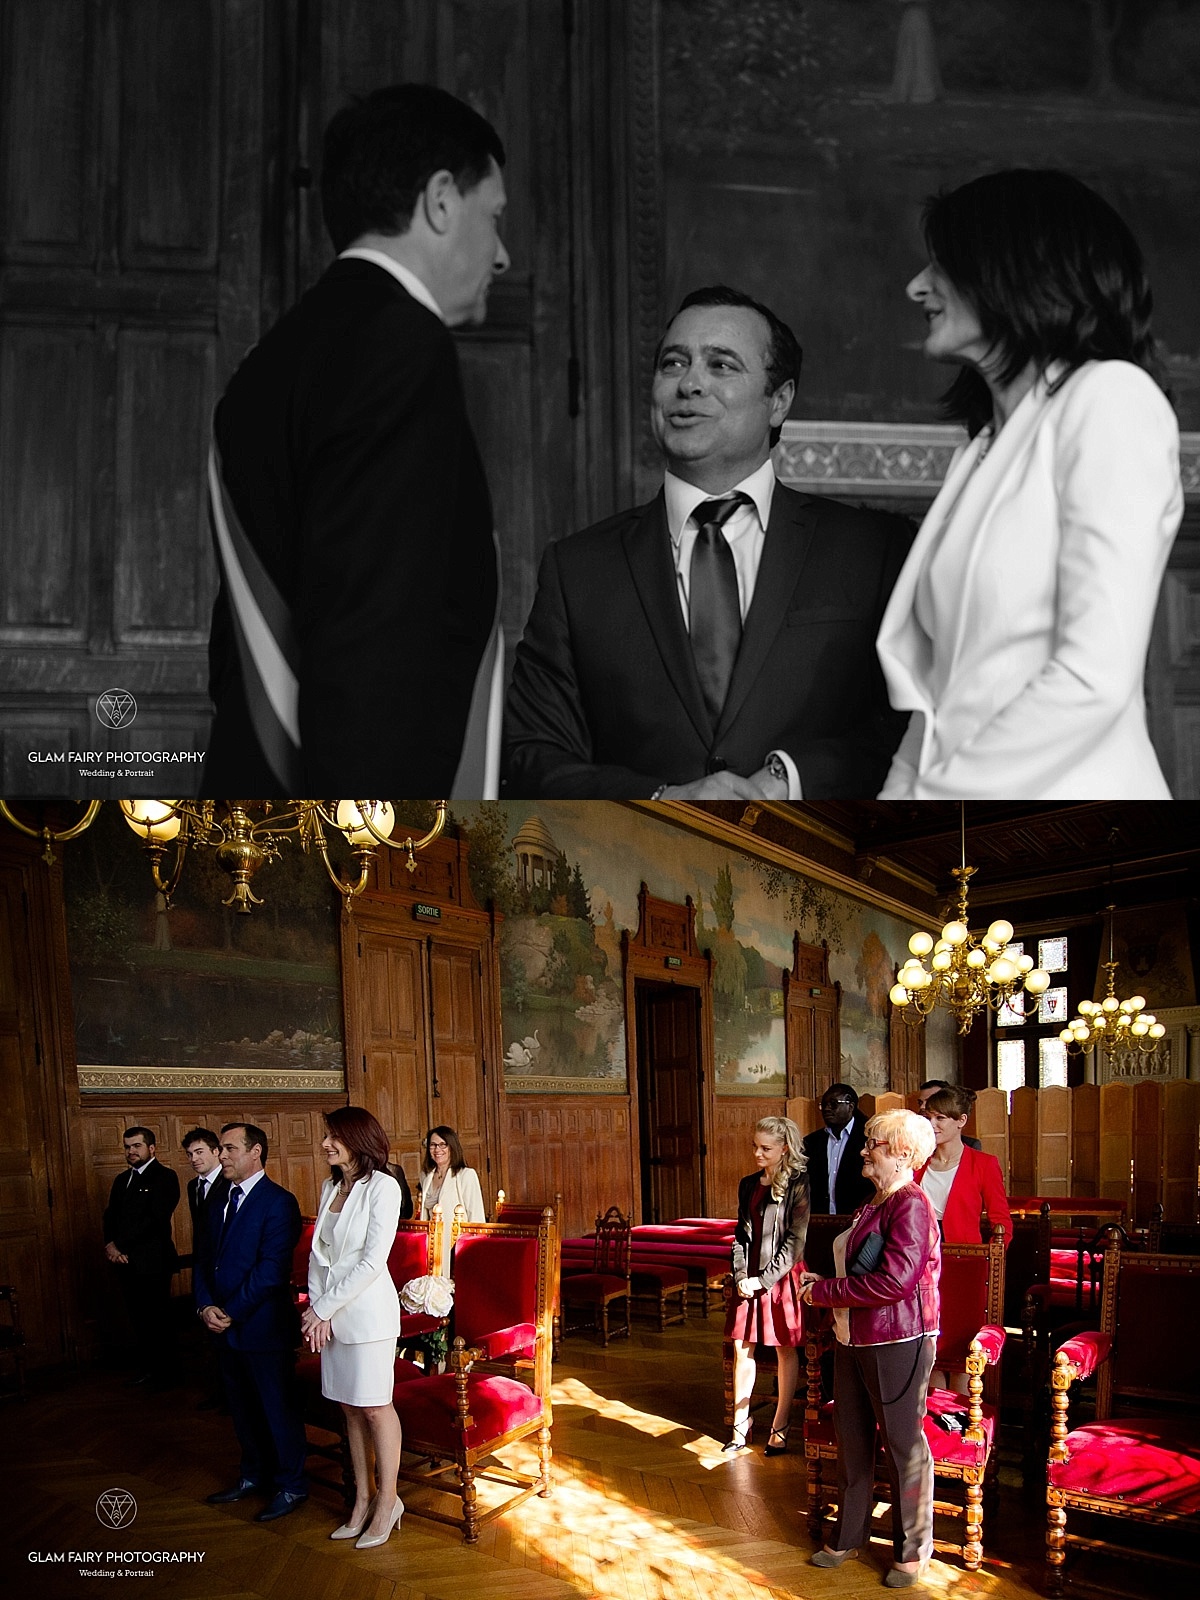 GlamFairyPhotography-mariage-civil-vincennes-patricia_0003